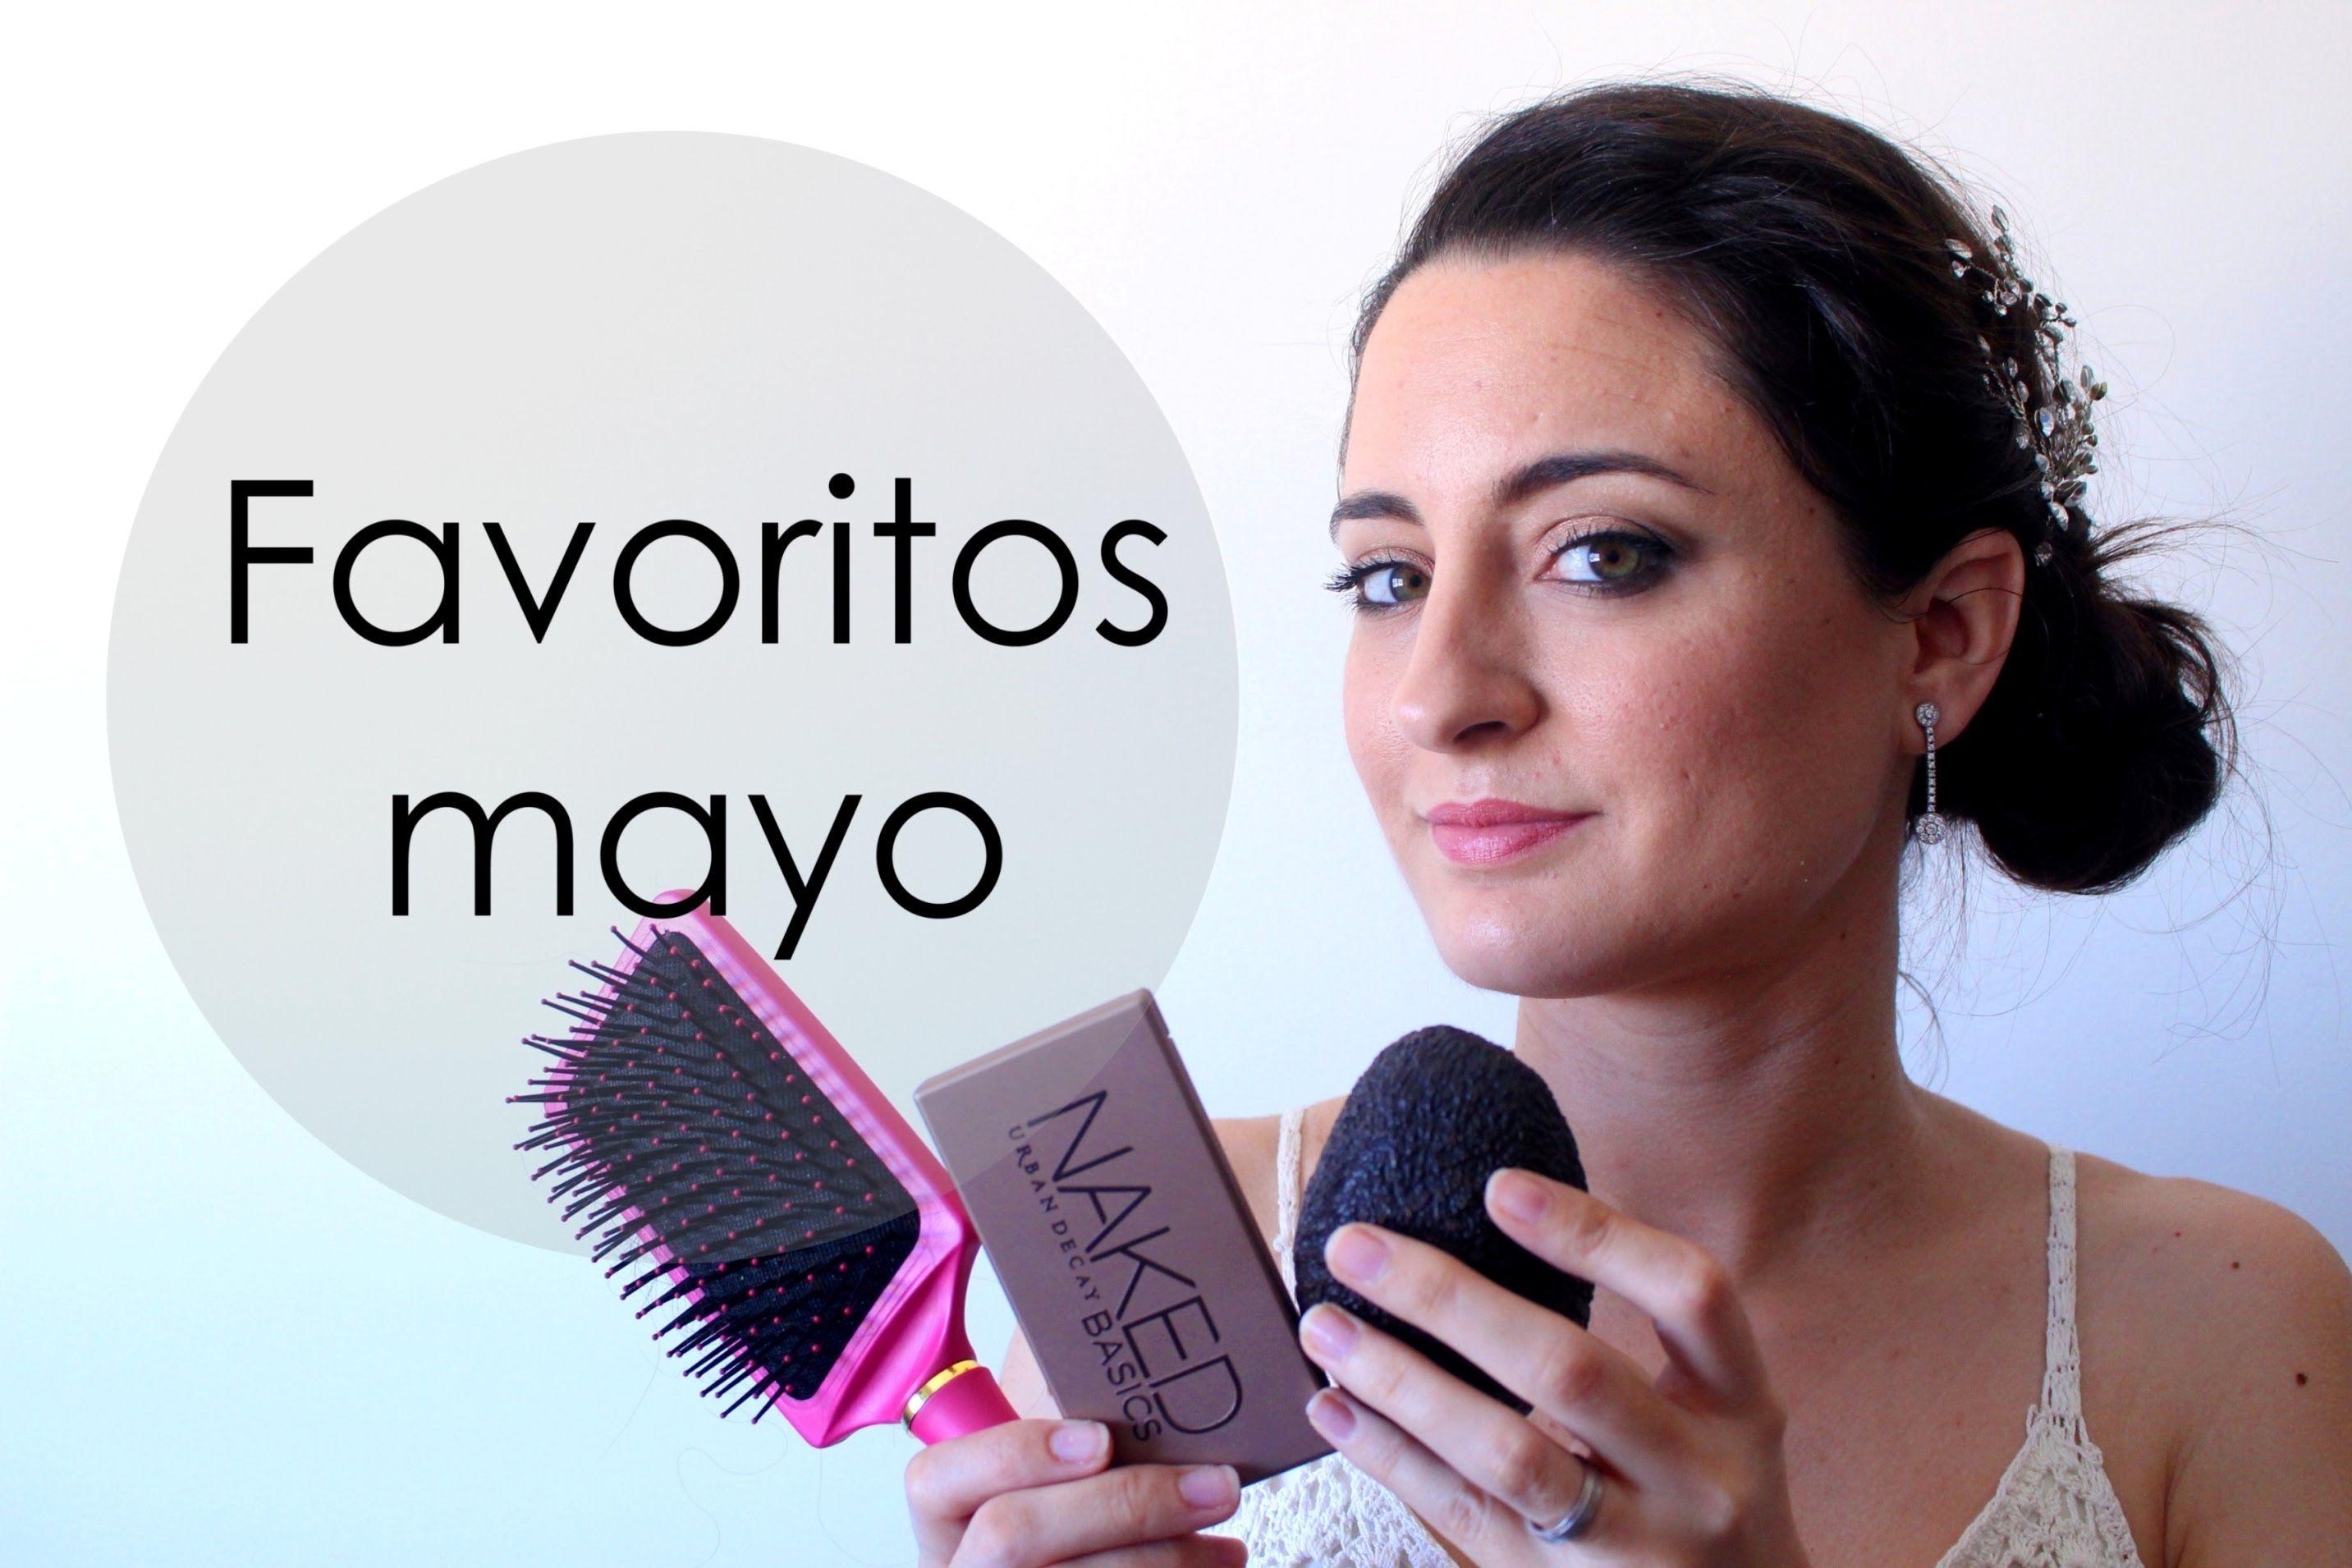 Favoritos mayo: Maquillaje, moda, comida, series...   Marleah Make Up